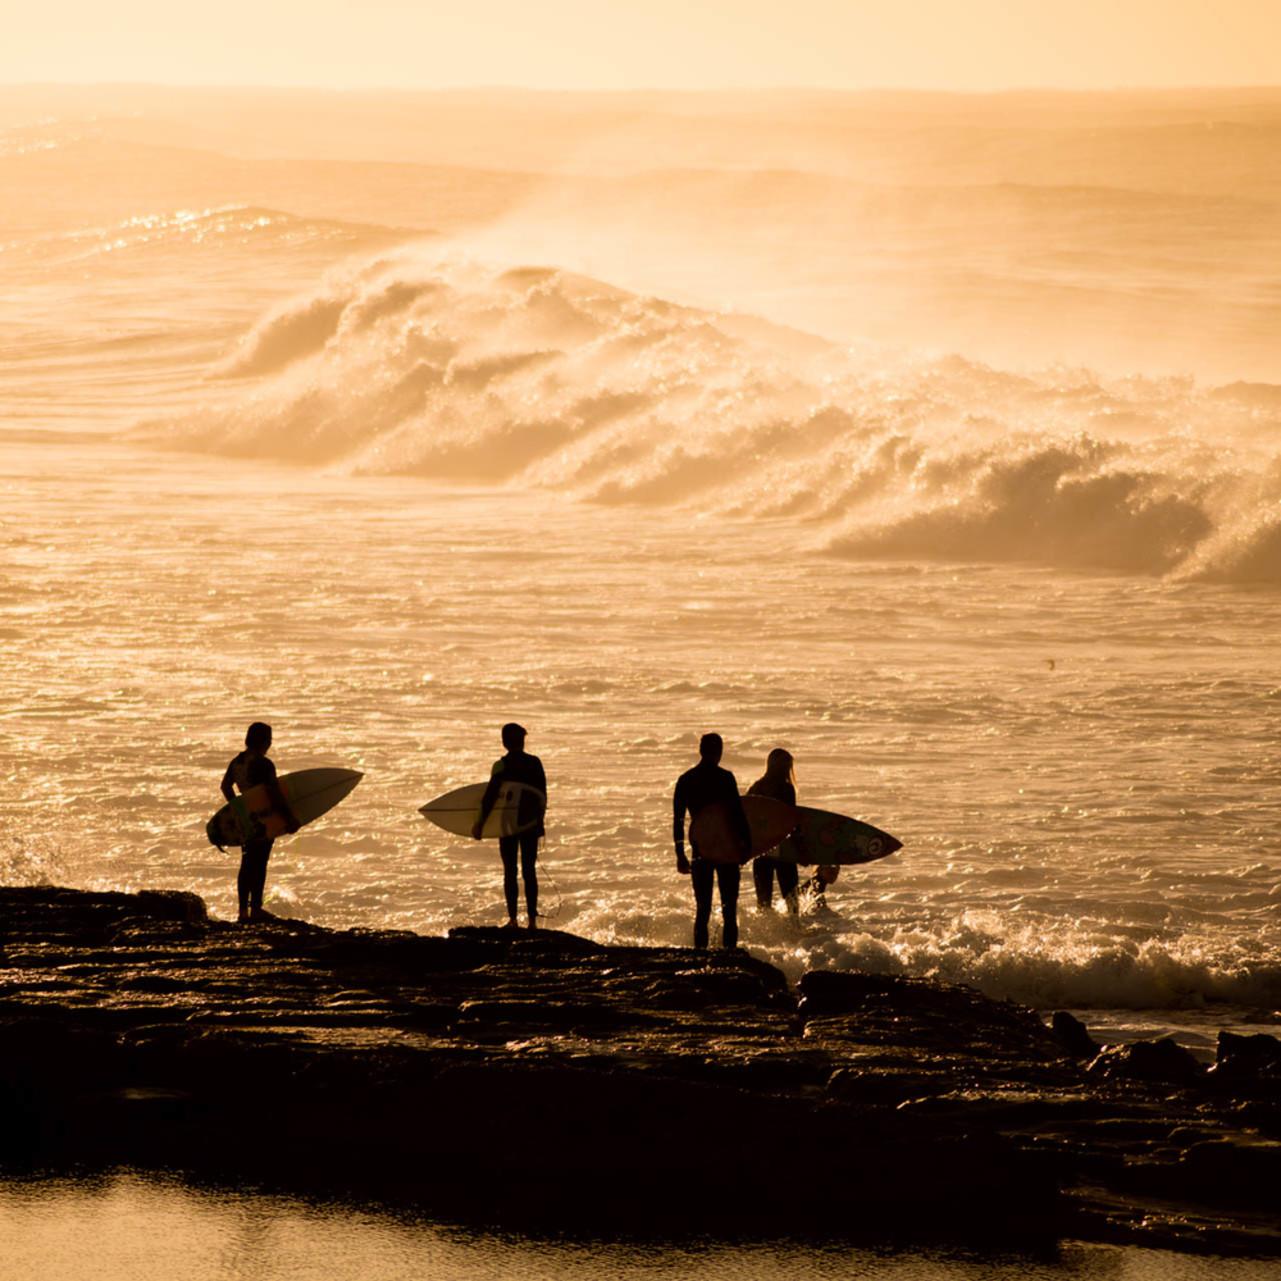 Surfers pause merewether beach newcastle nsw australia ljfklf